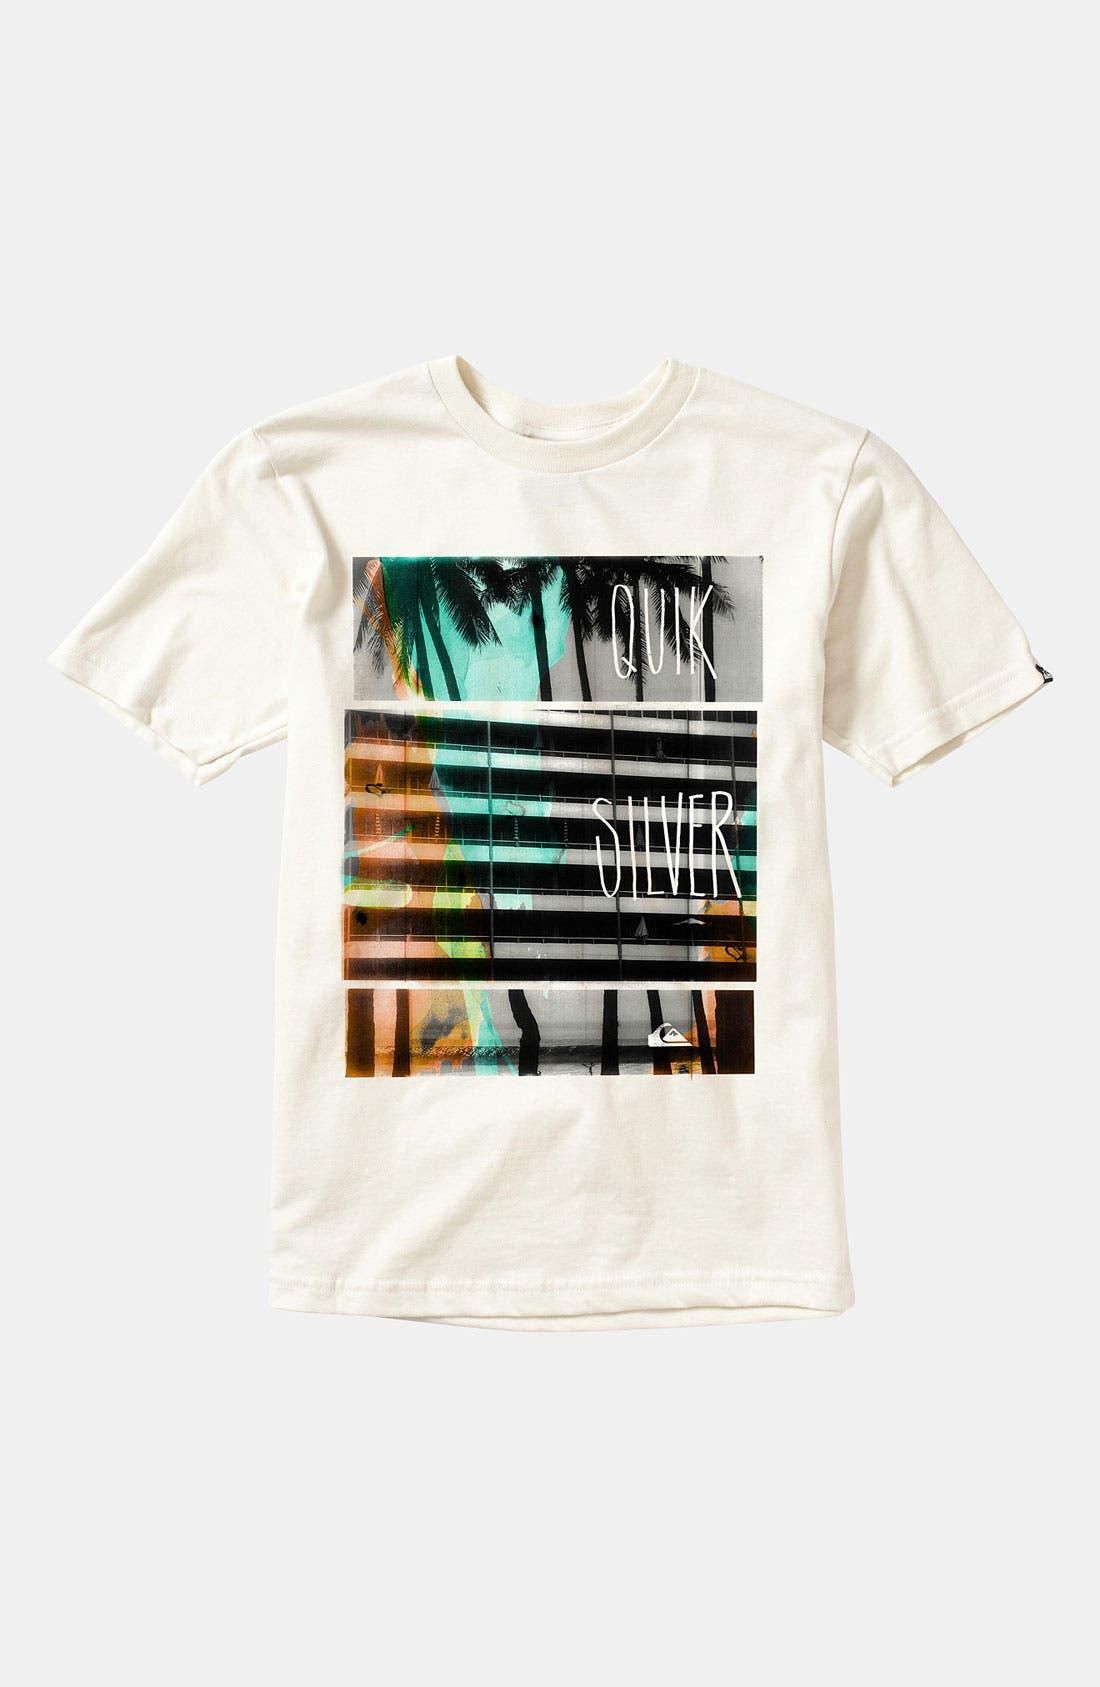 Alternate Image 1 Selected - Quiksilver 'High Rise' T-Shirt (Big Boys)